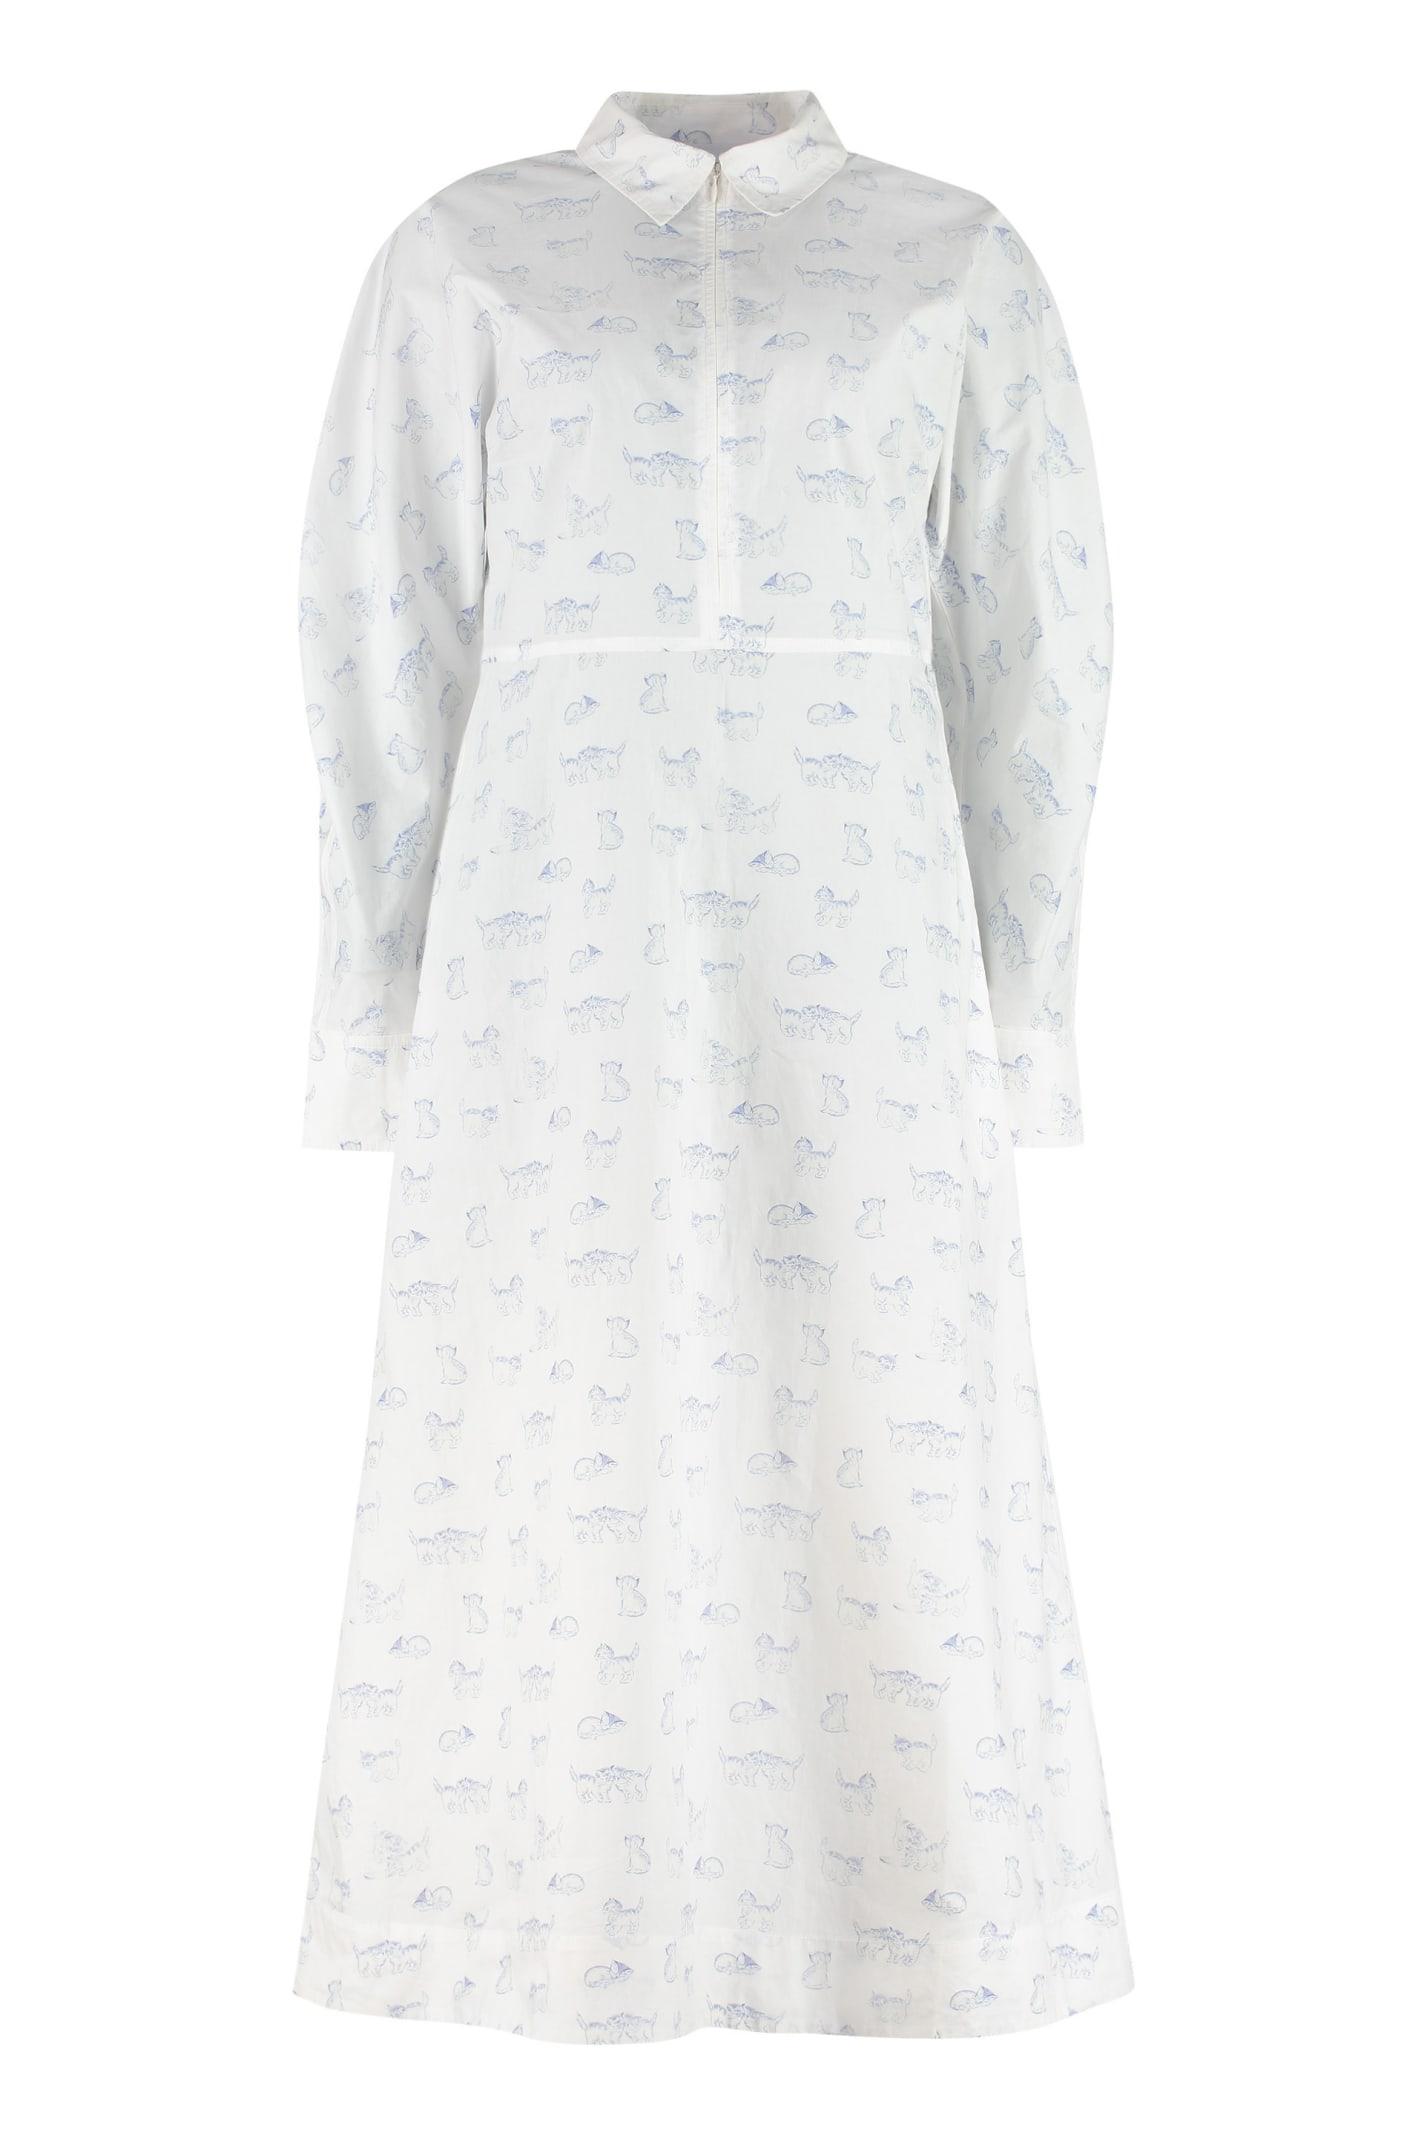 Ganni Cotton Shirtdress